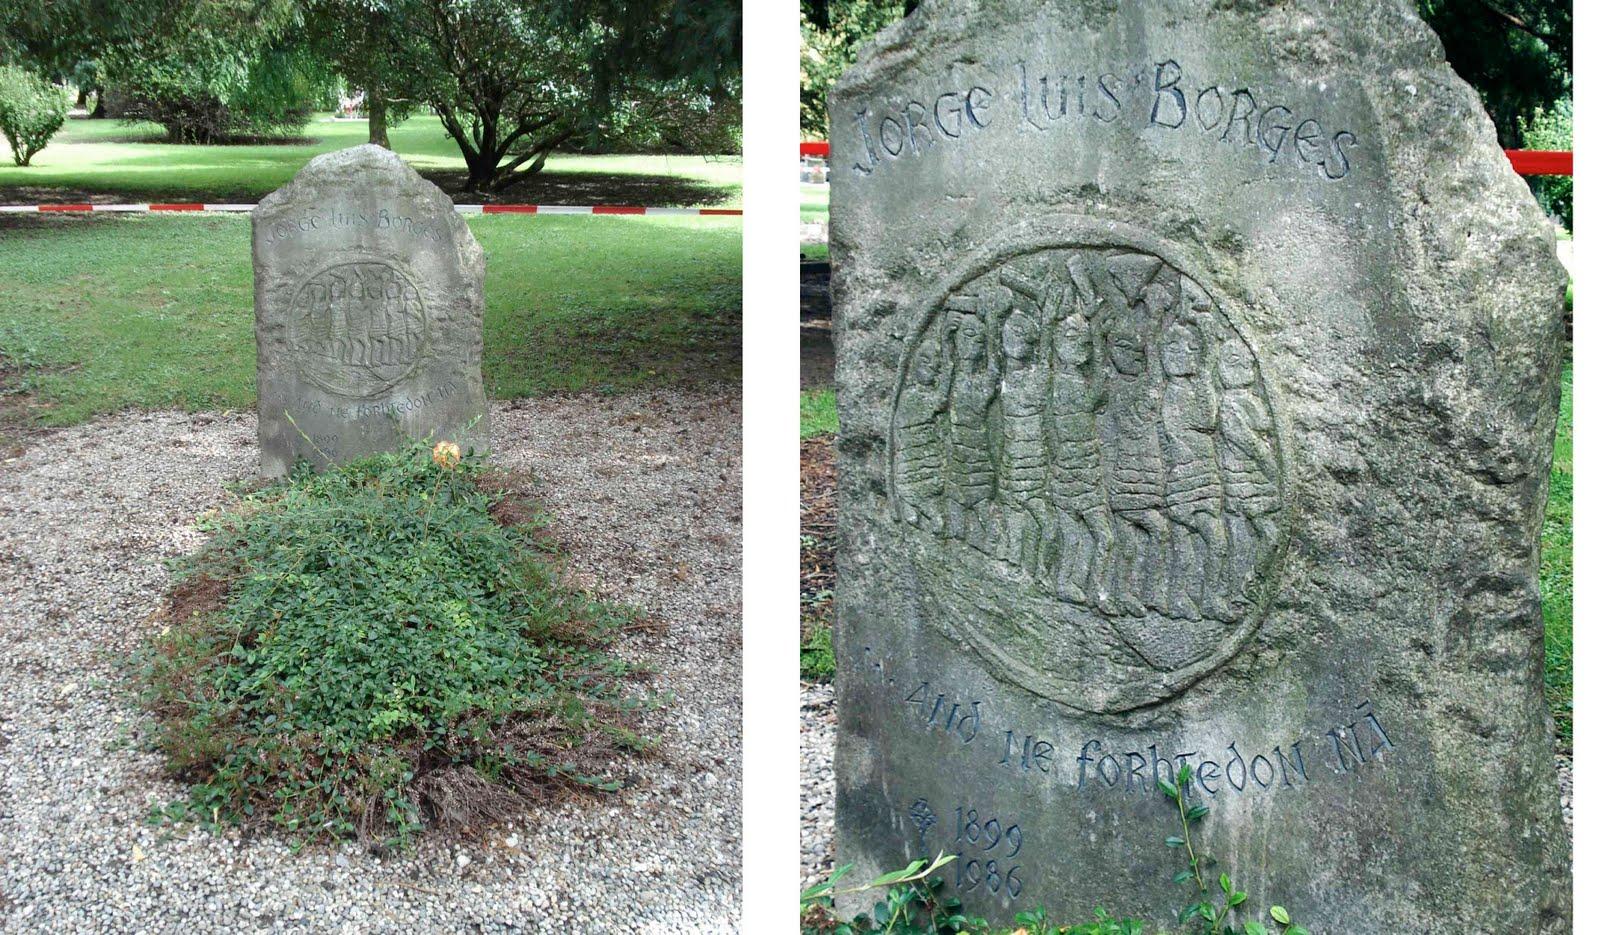 Aquí descansa Jorge Luis Borges, Cementerio Plain Palais, Ginebra - (Hay más foto a tu derecha)  -